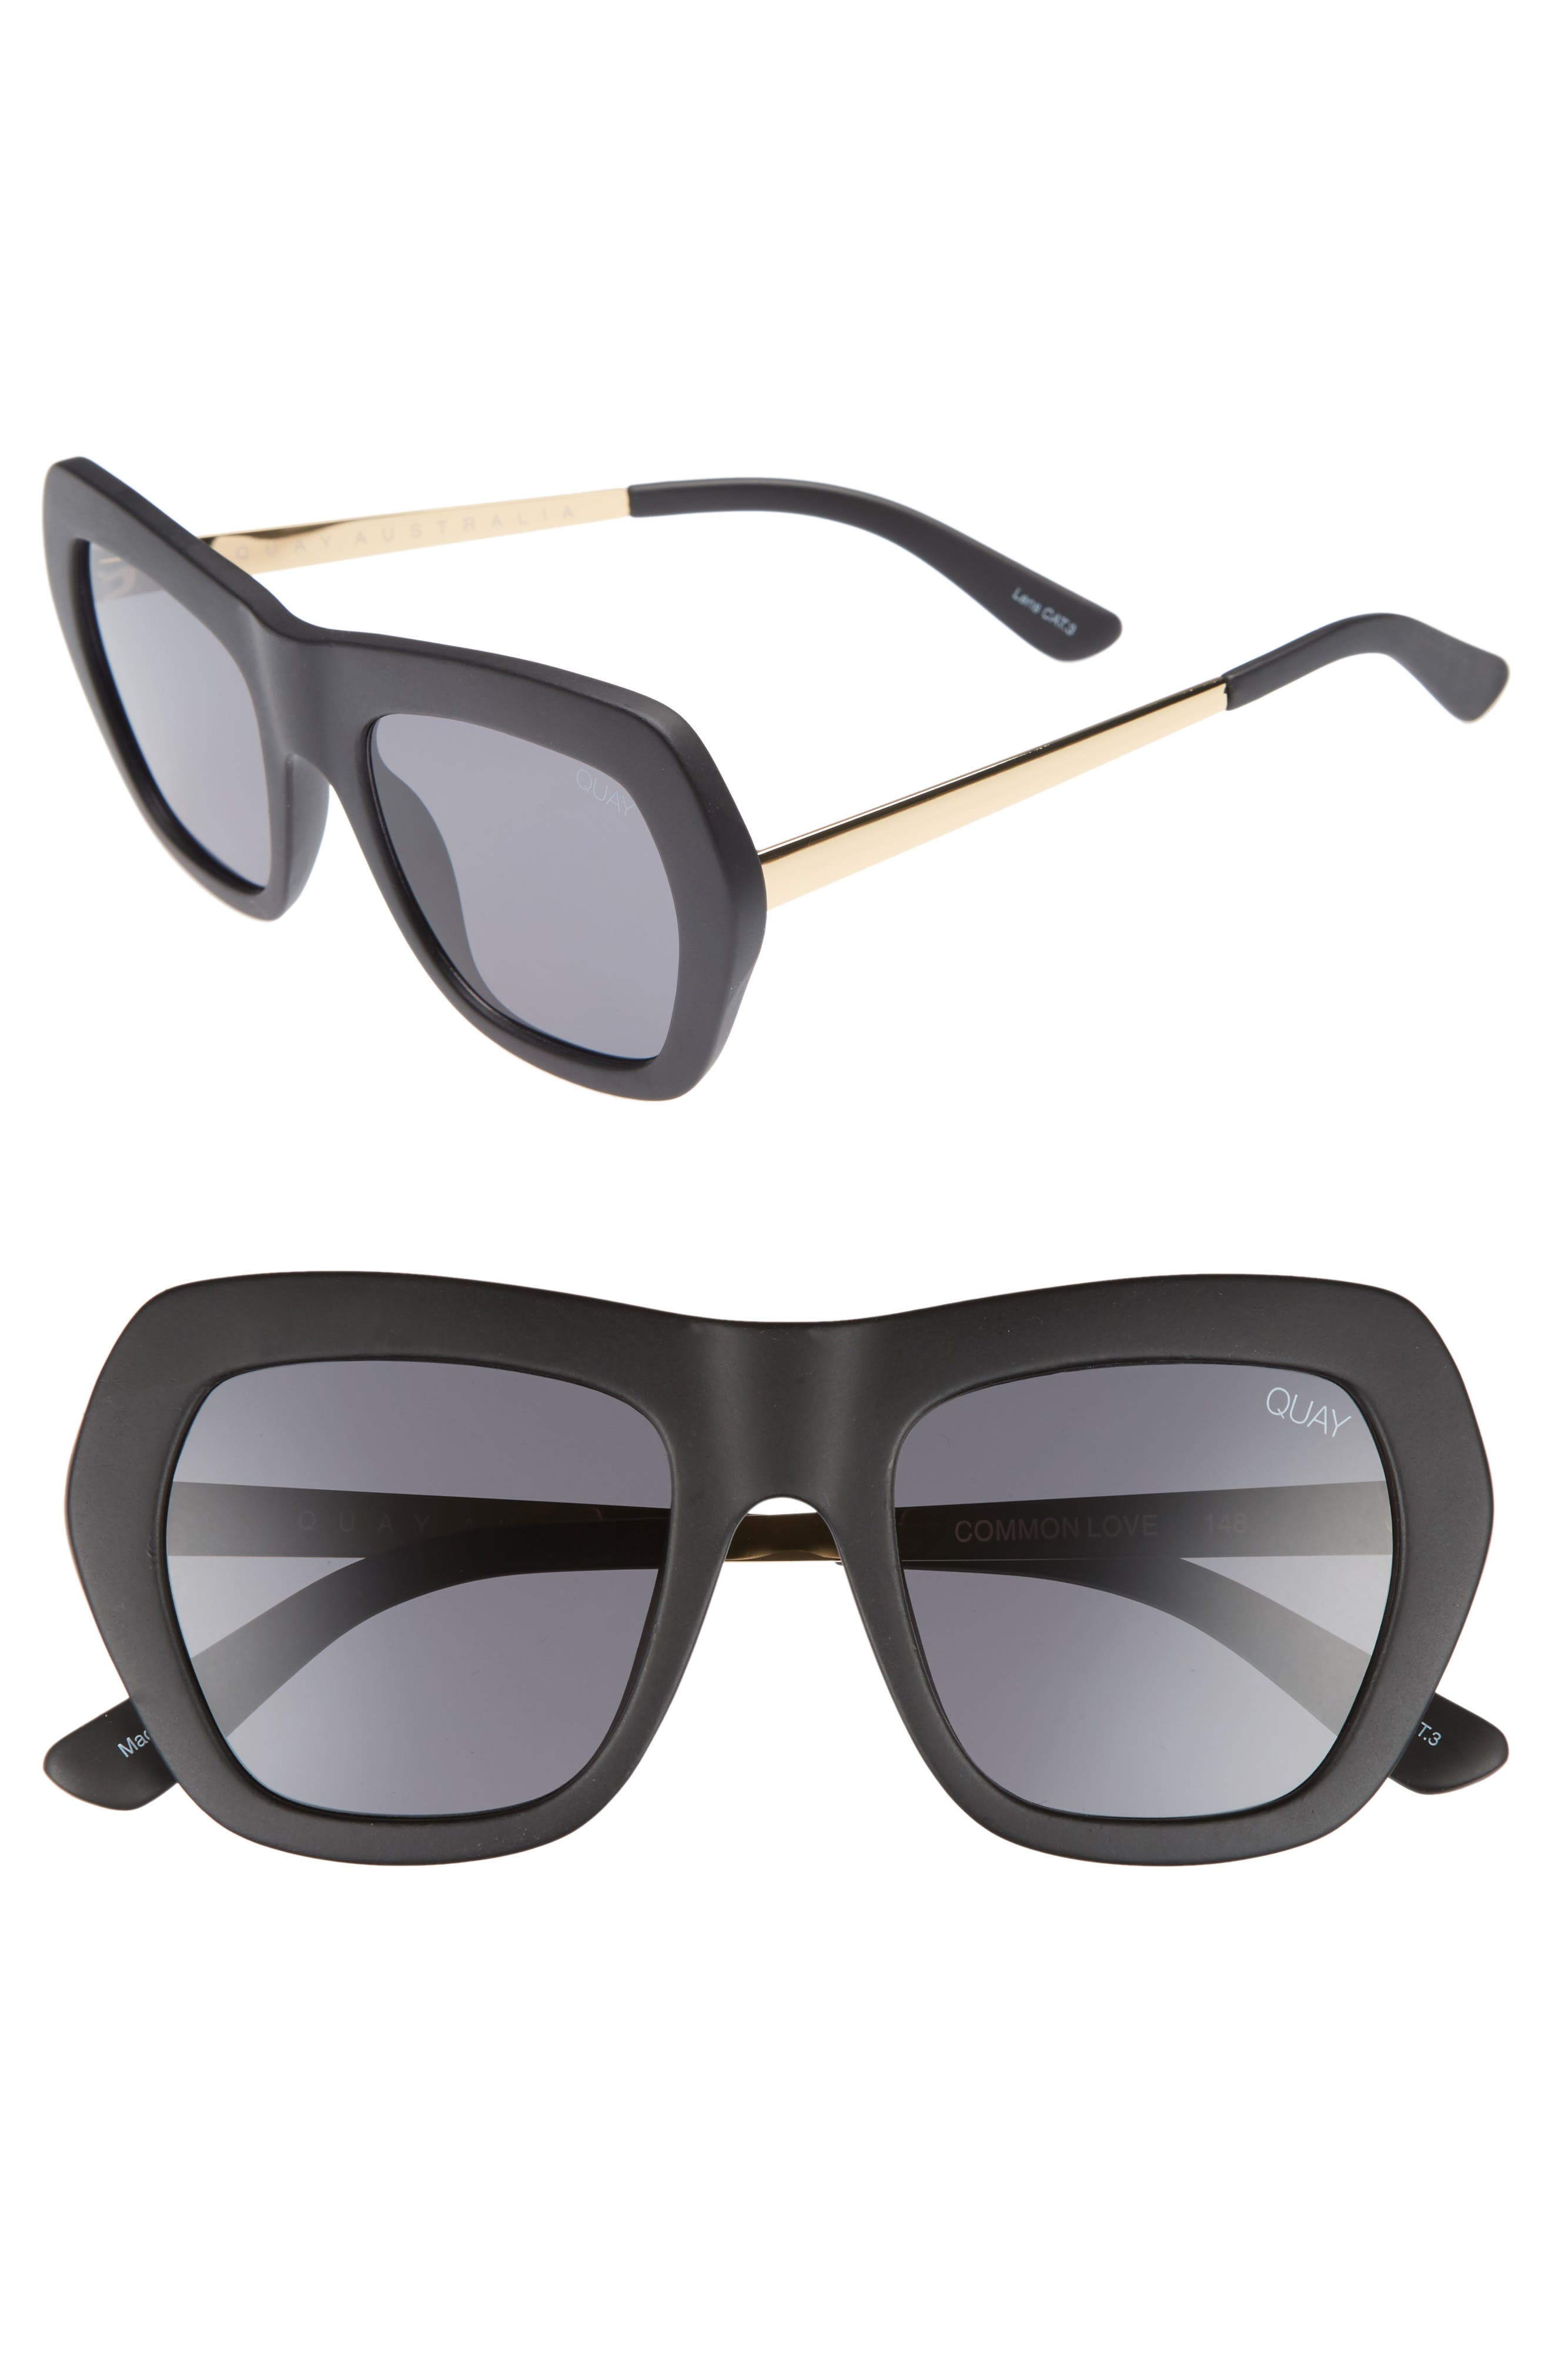 Common Love 53mm Square Sunglasses,                             Main thumbnail 1, color,